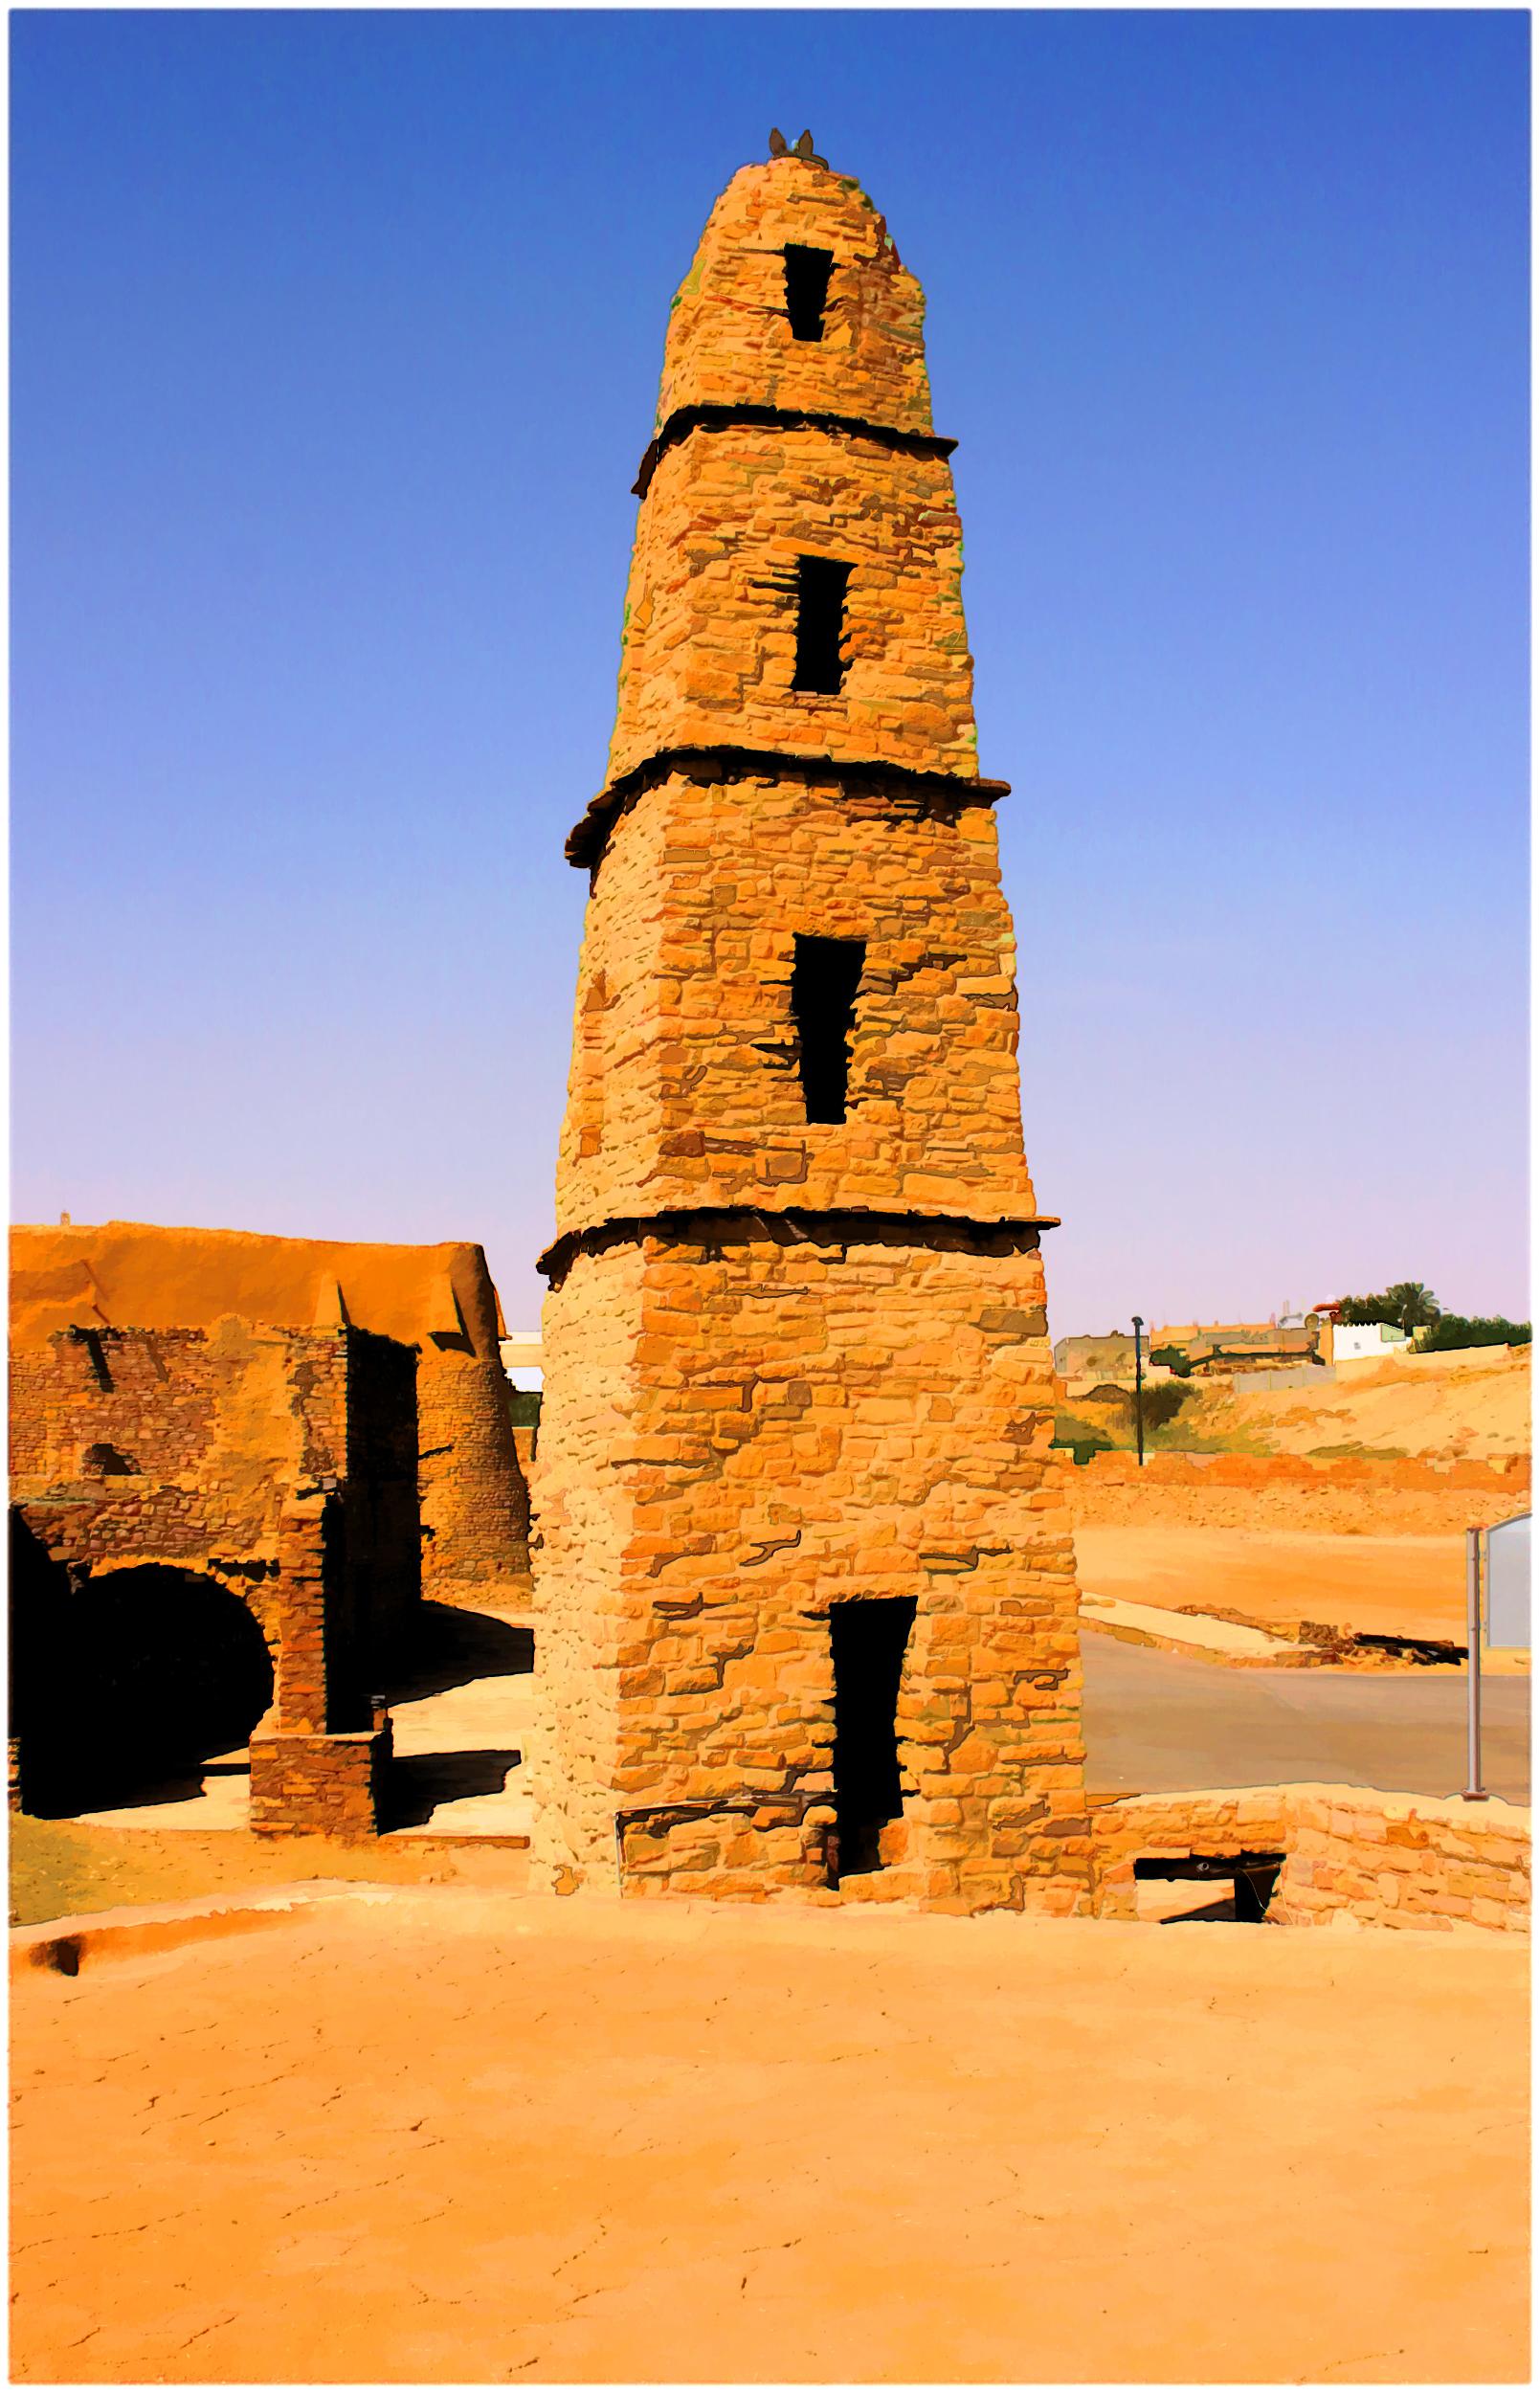 File:Mosque of Omar Ibn al-Khattab jpg - Wikimedia Commons